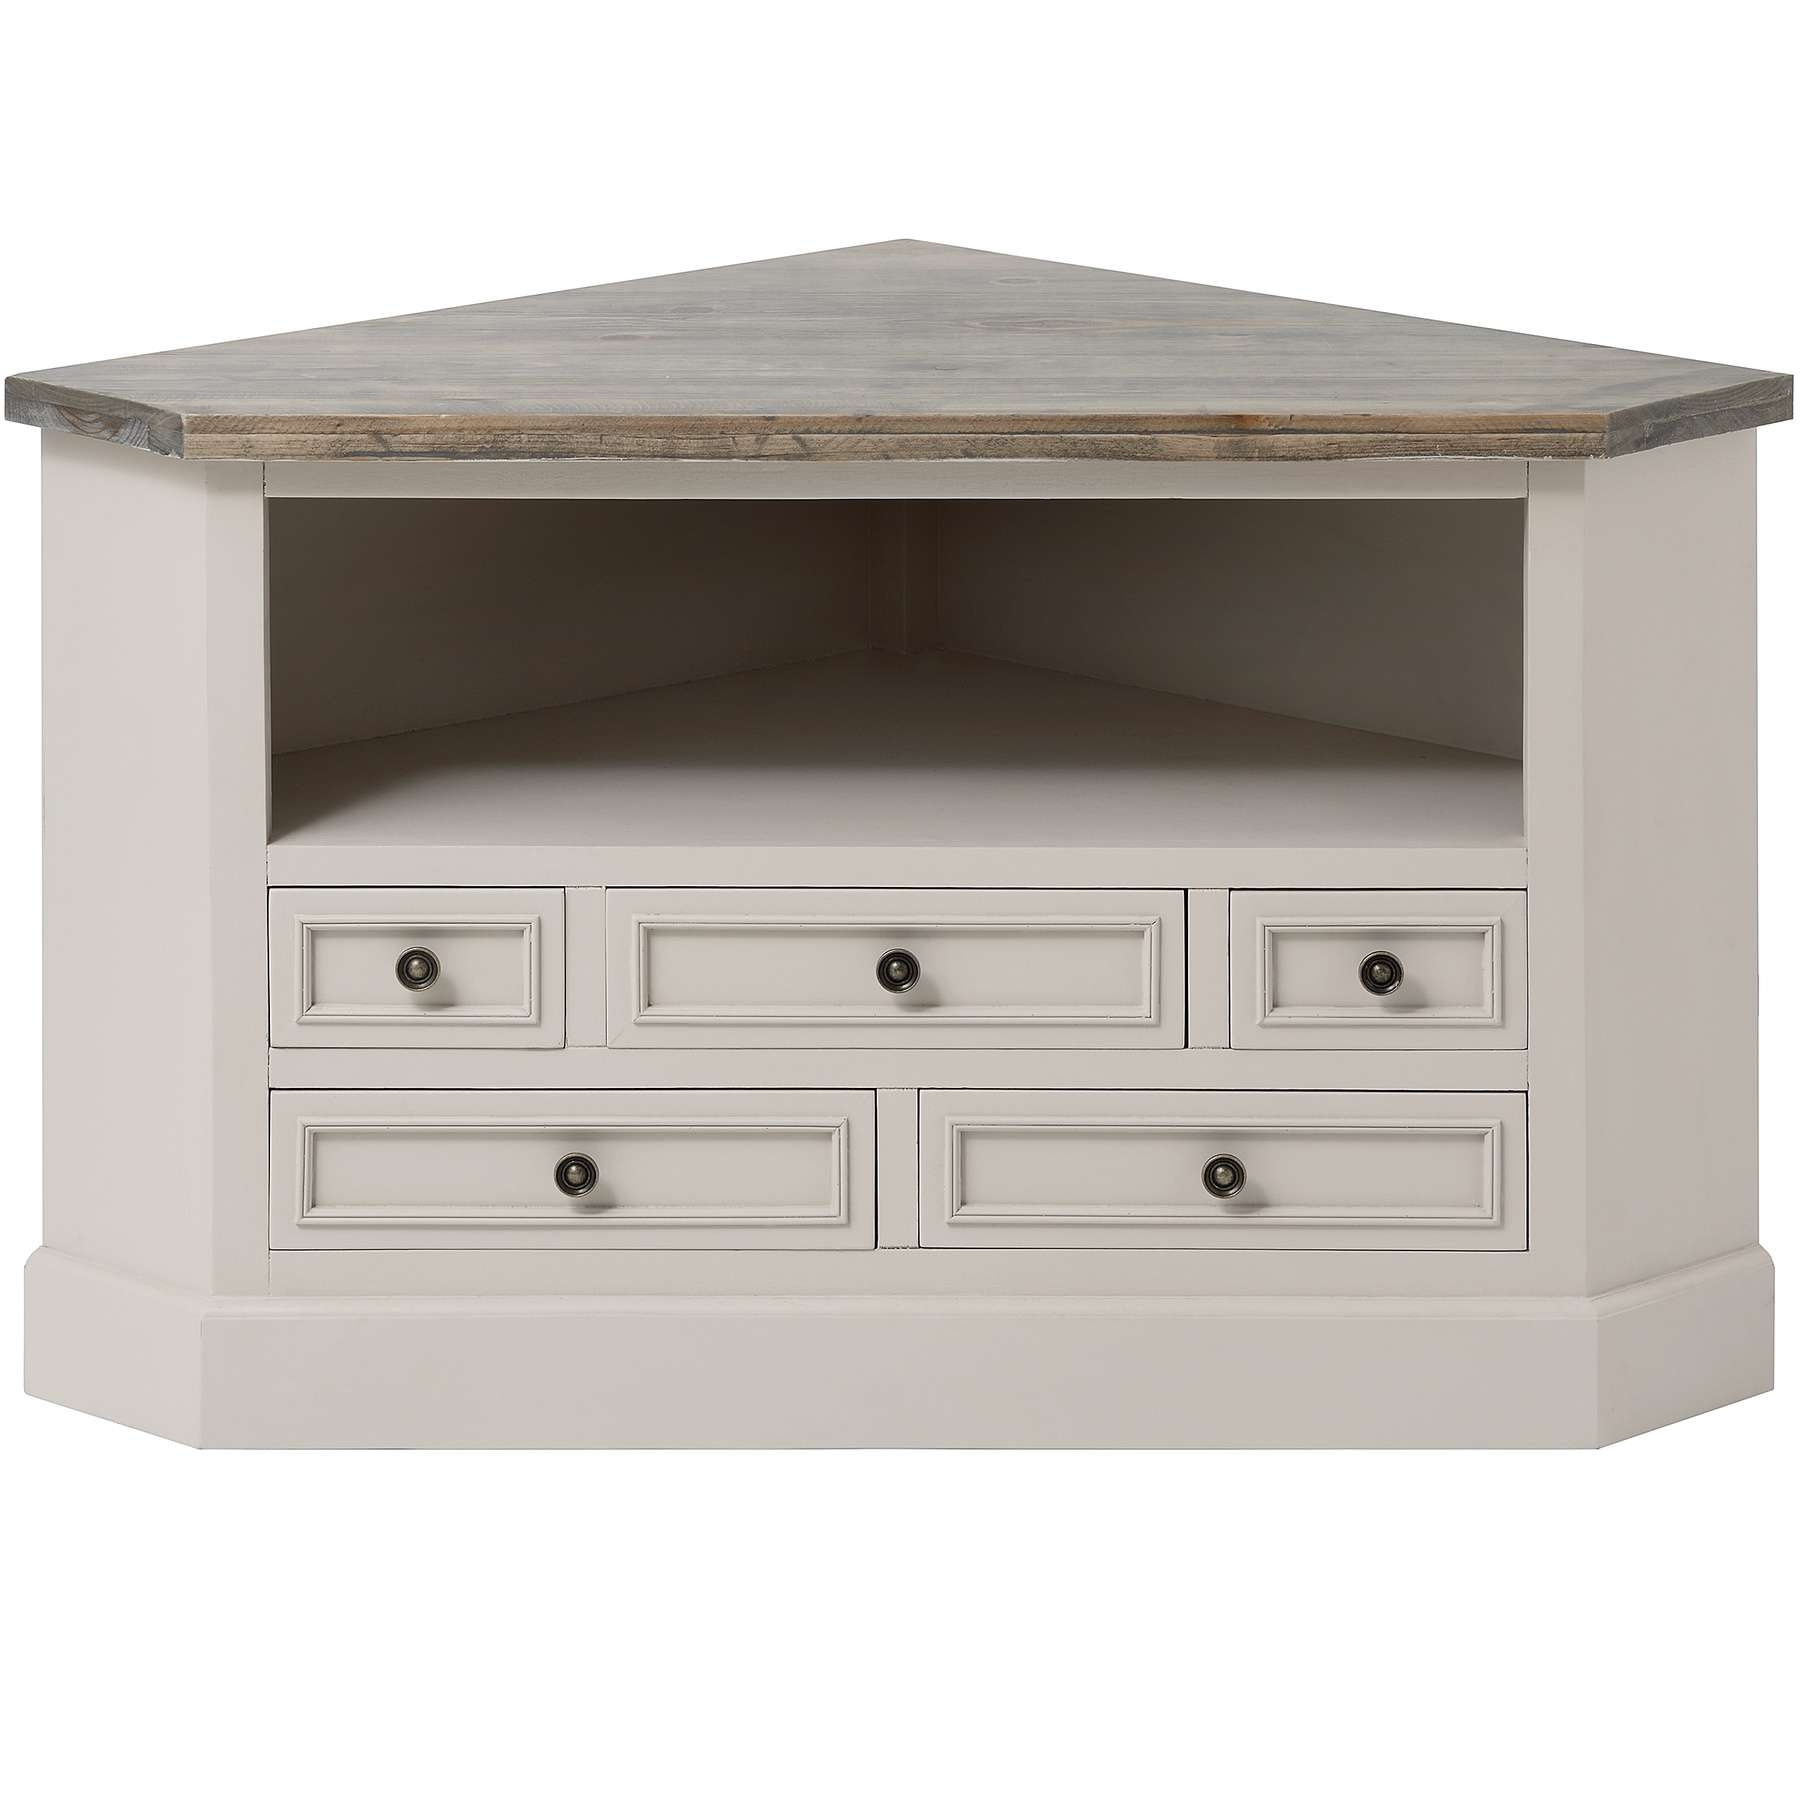 White Corner Tv Cabinet – Home Design Ideas And Pictures Intended For White Corner Tv Cabinets (View 4 of 20)